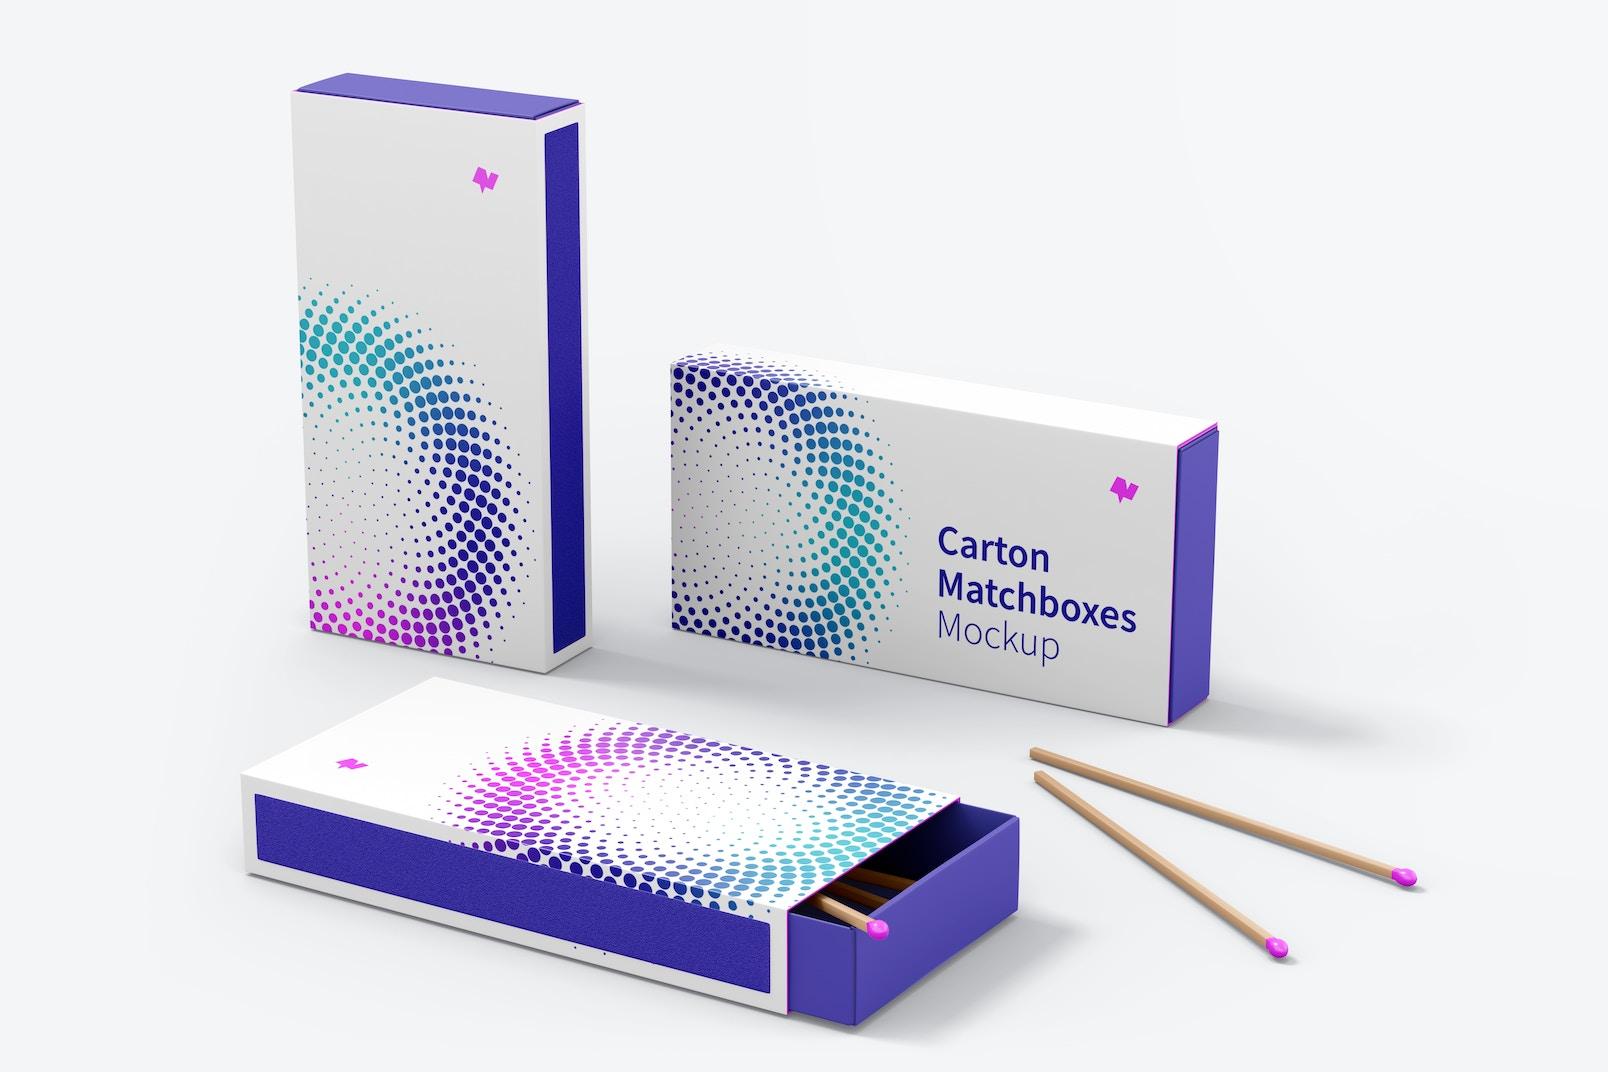 Carton Matchboxes Mockup, Multiple Views Set